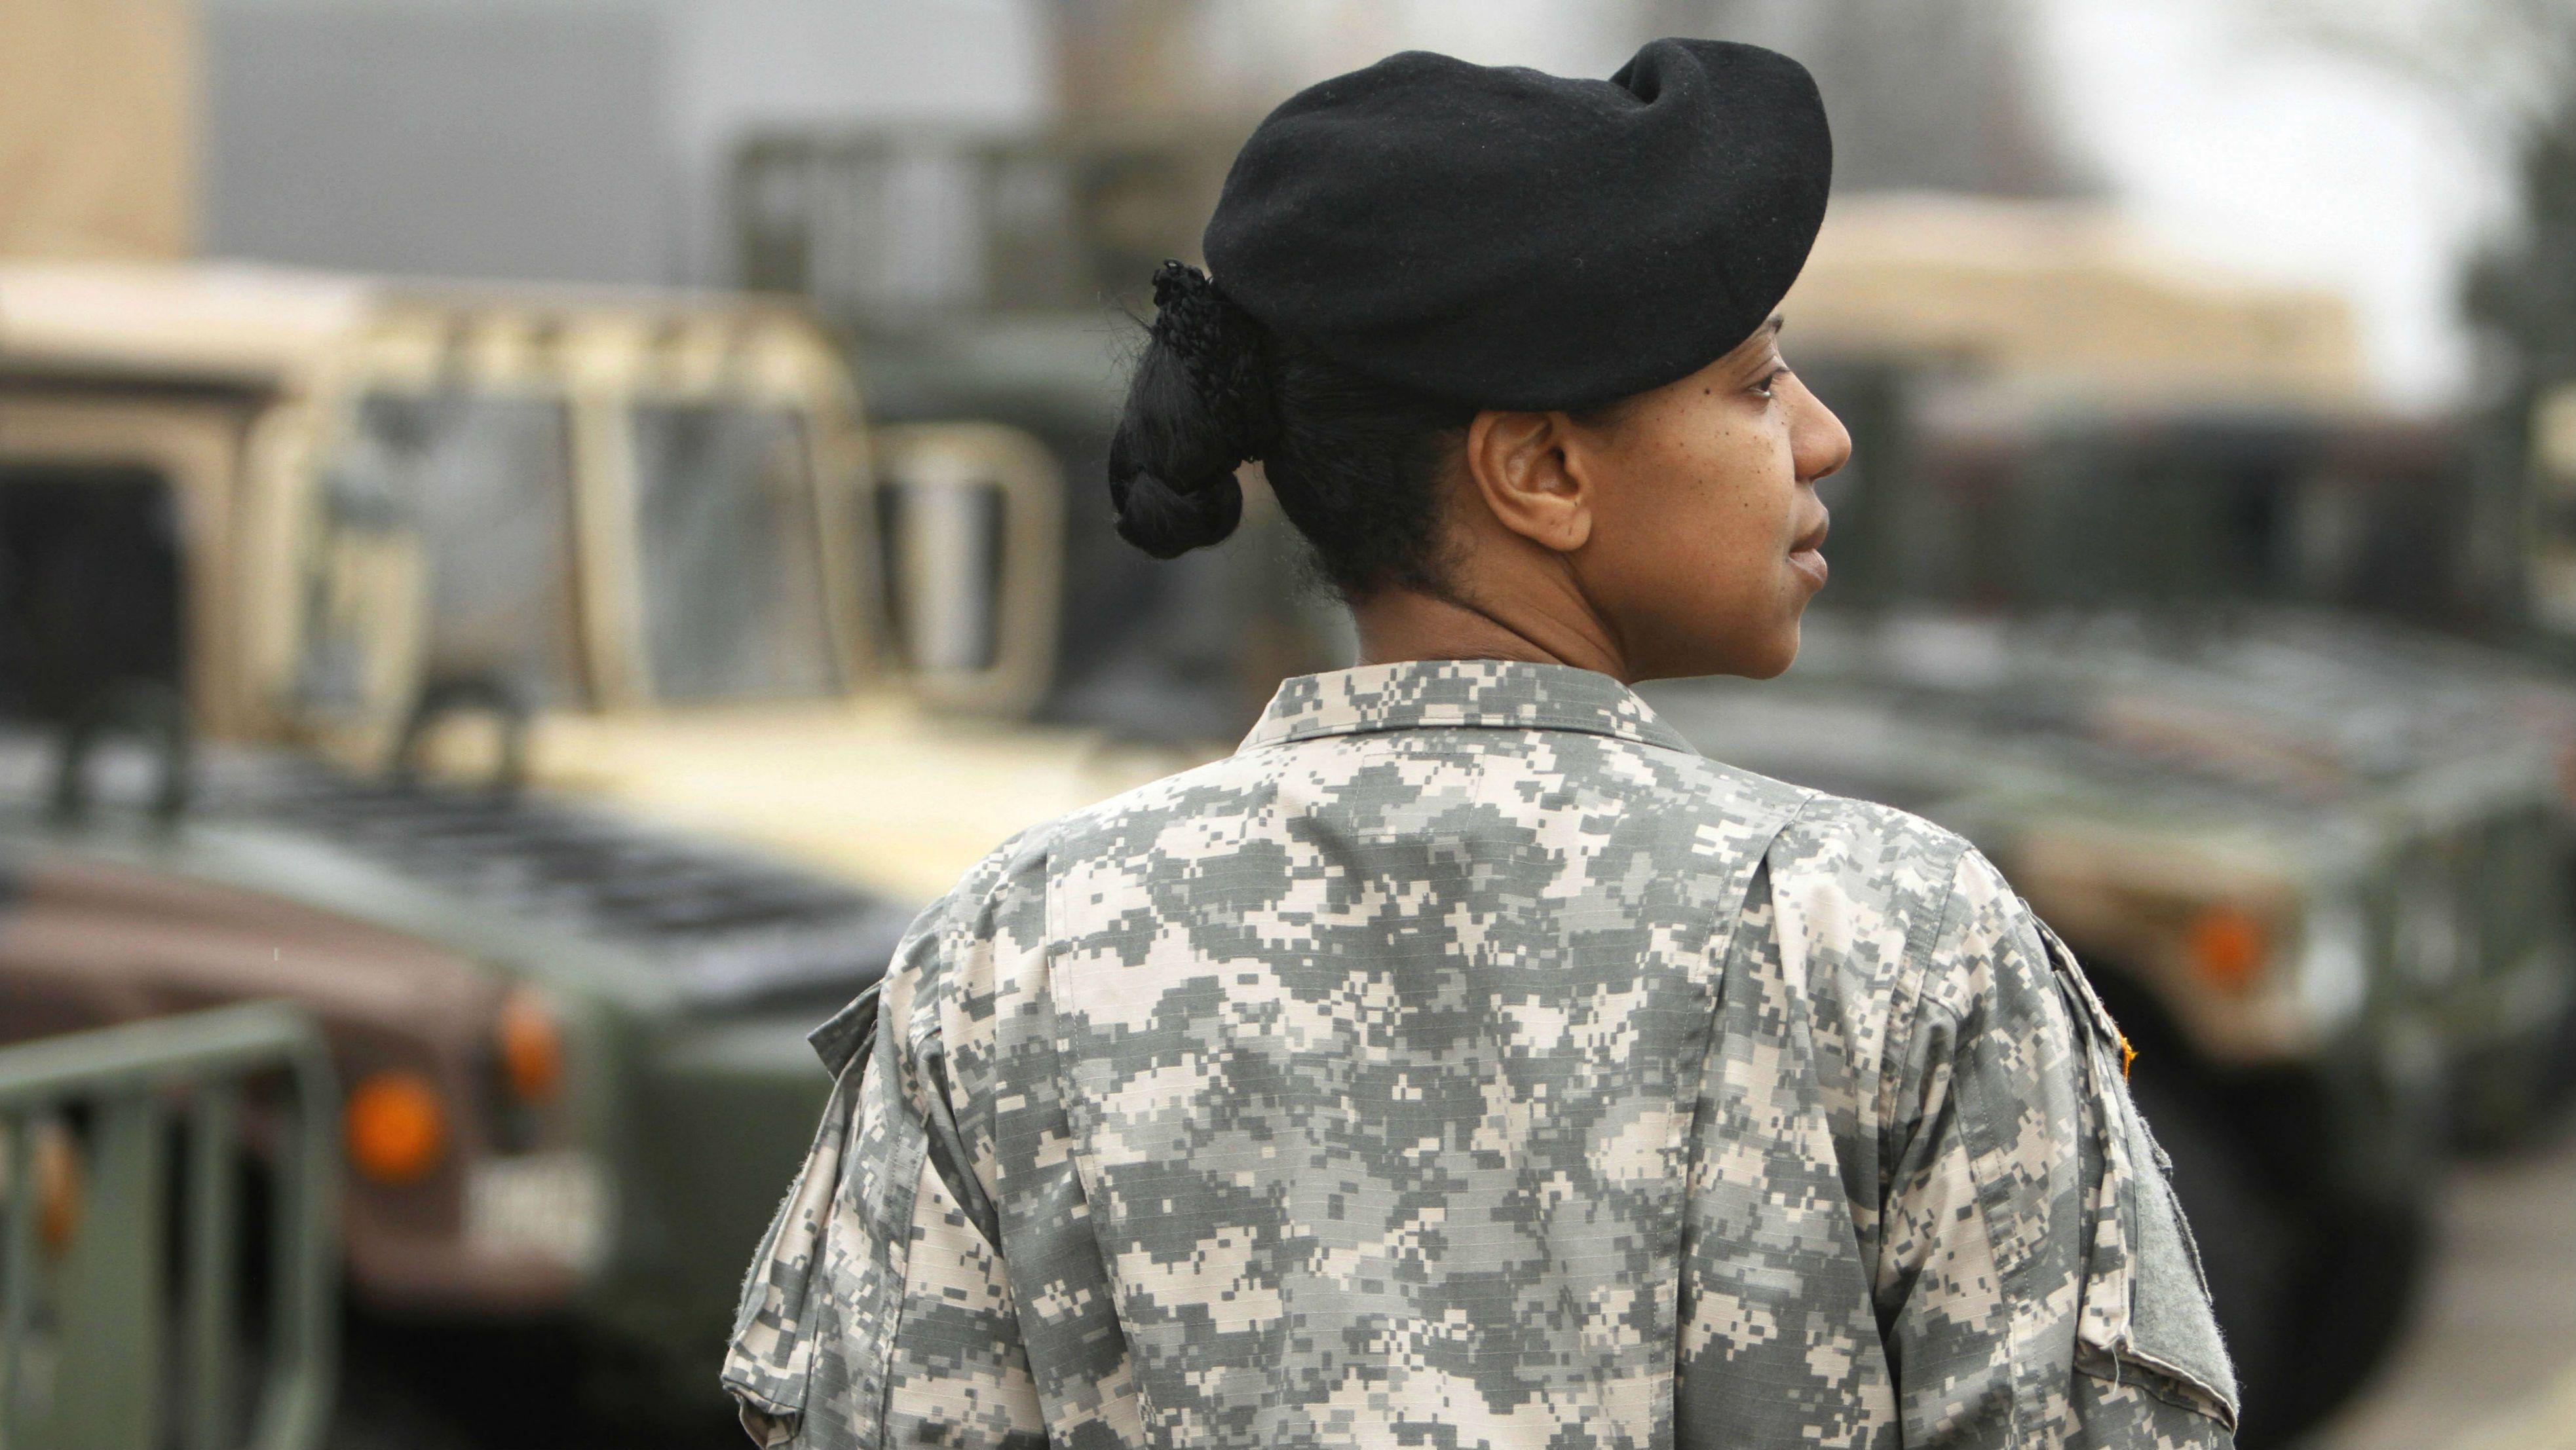 A female officer